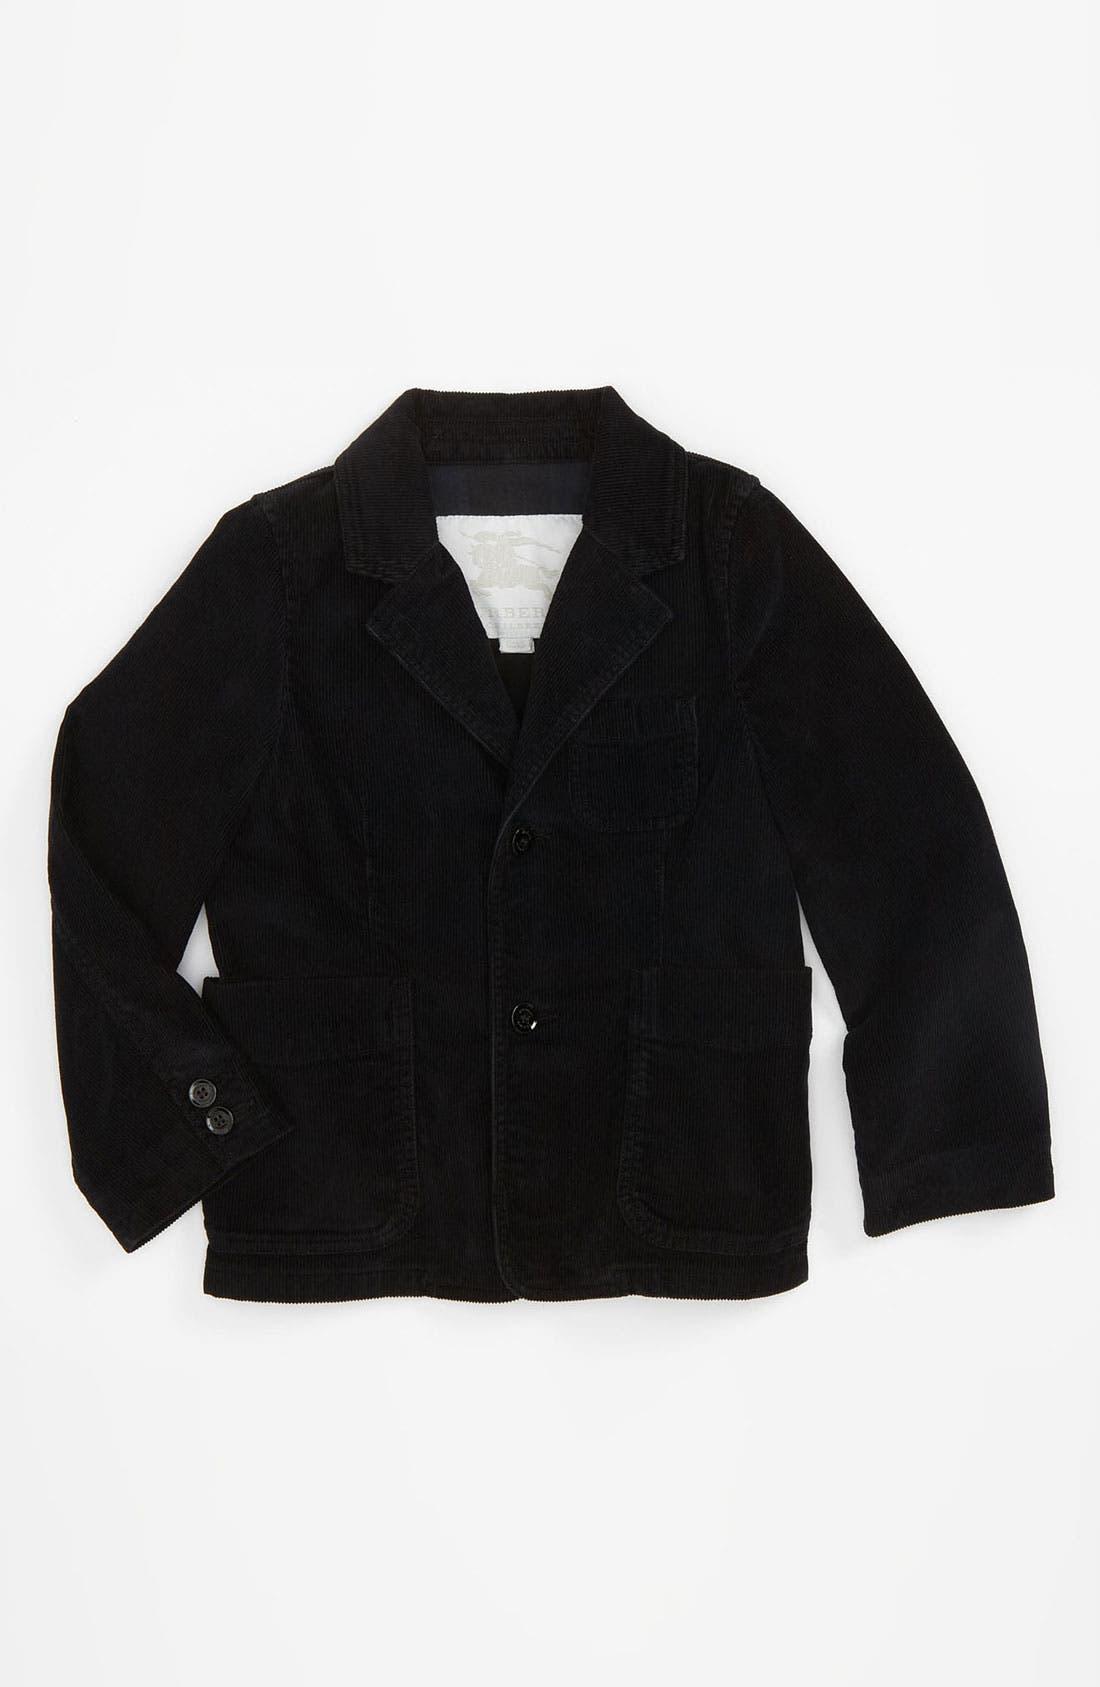 Main Image - Burberry Tailored Corduroy Jacket (Infant)